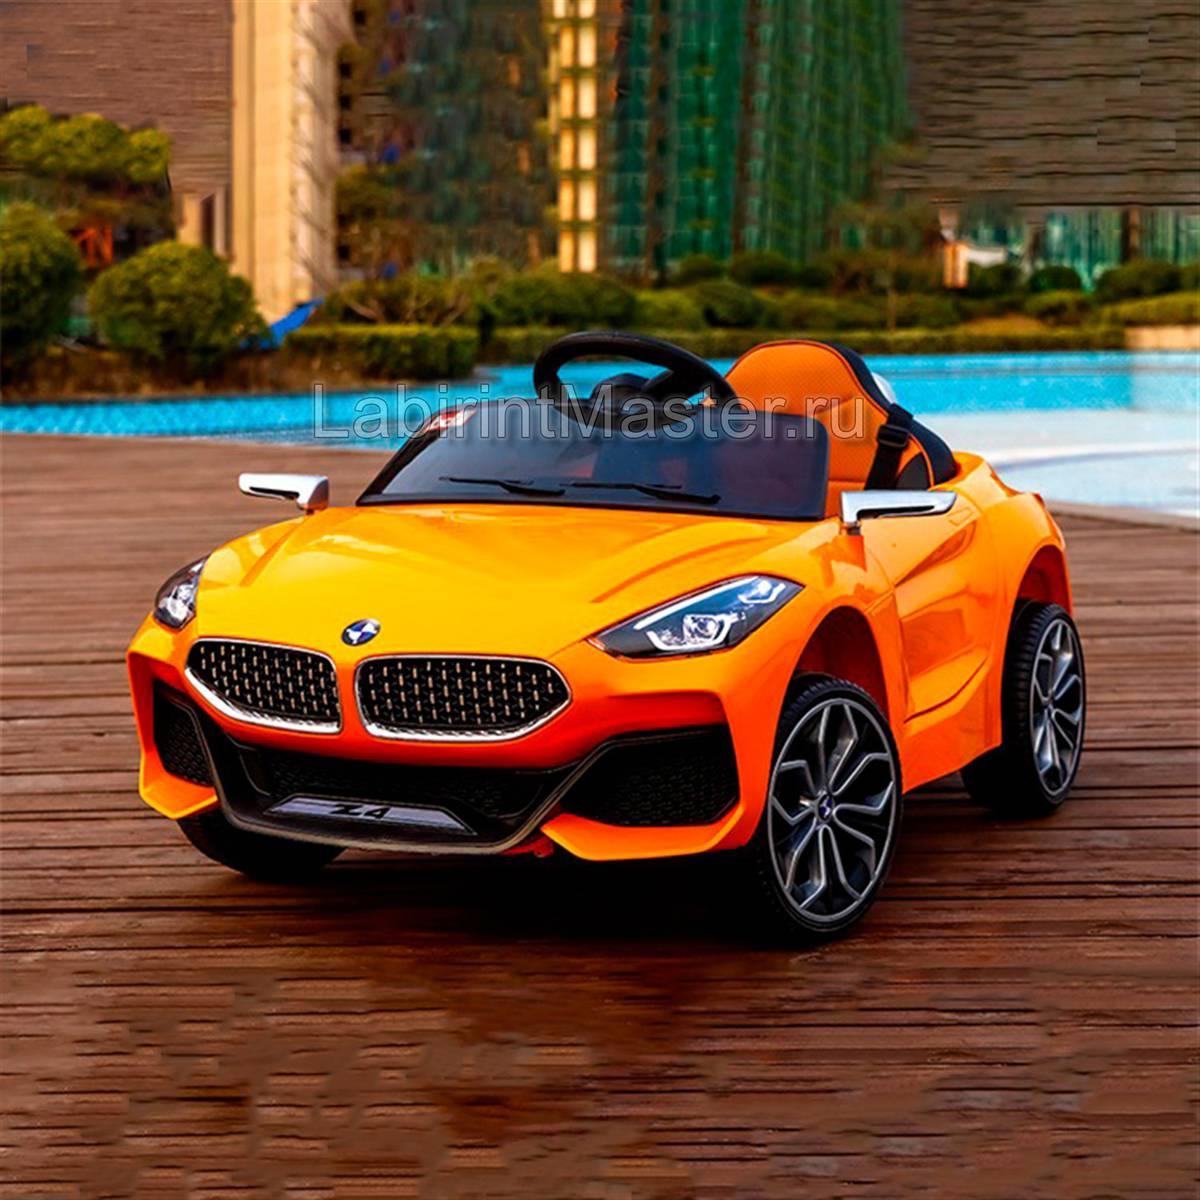 Детский электромобиль «BMW Z4» оранжевый | ЛабиринтМастер